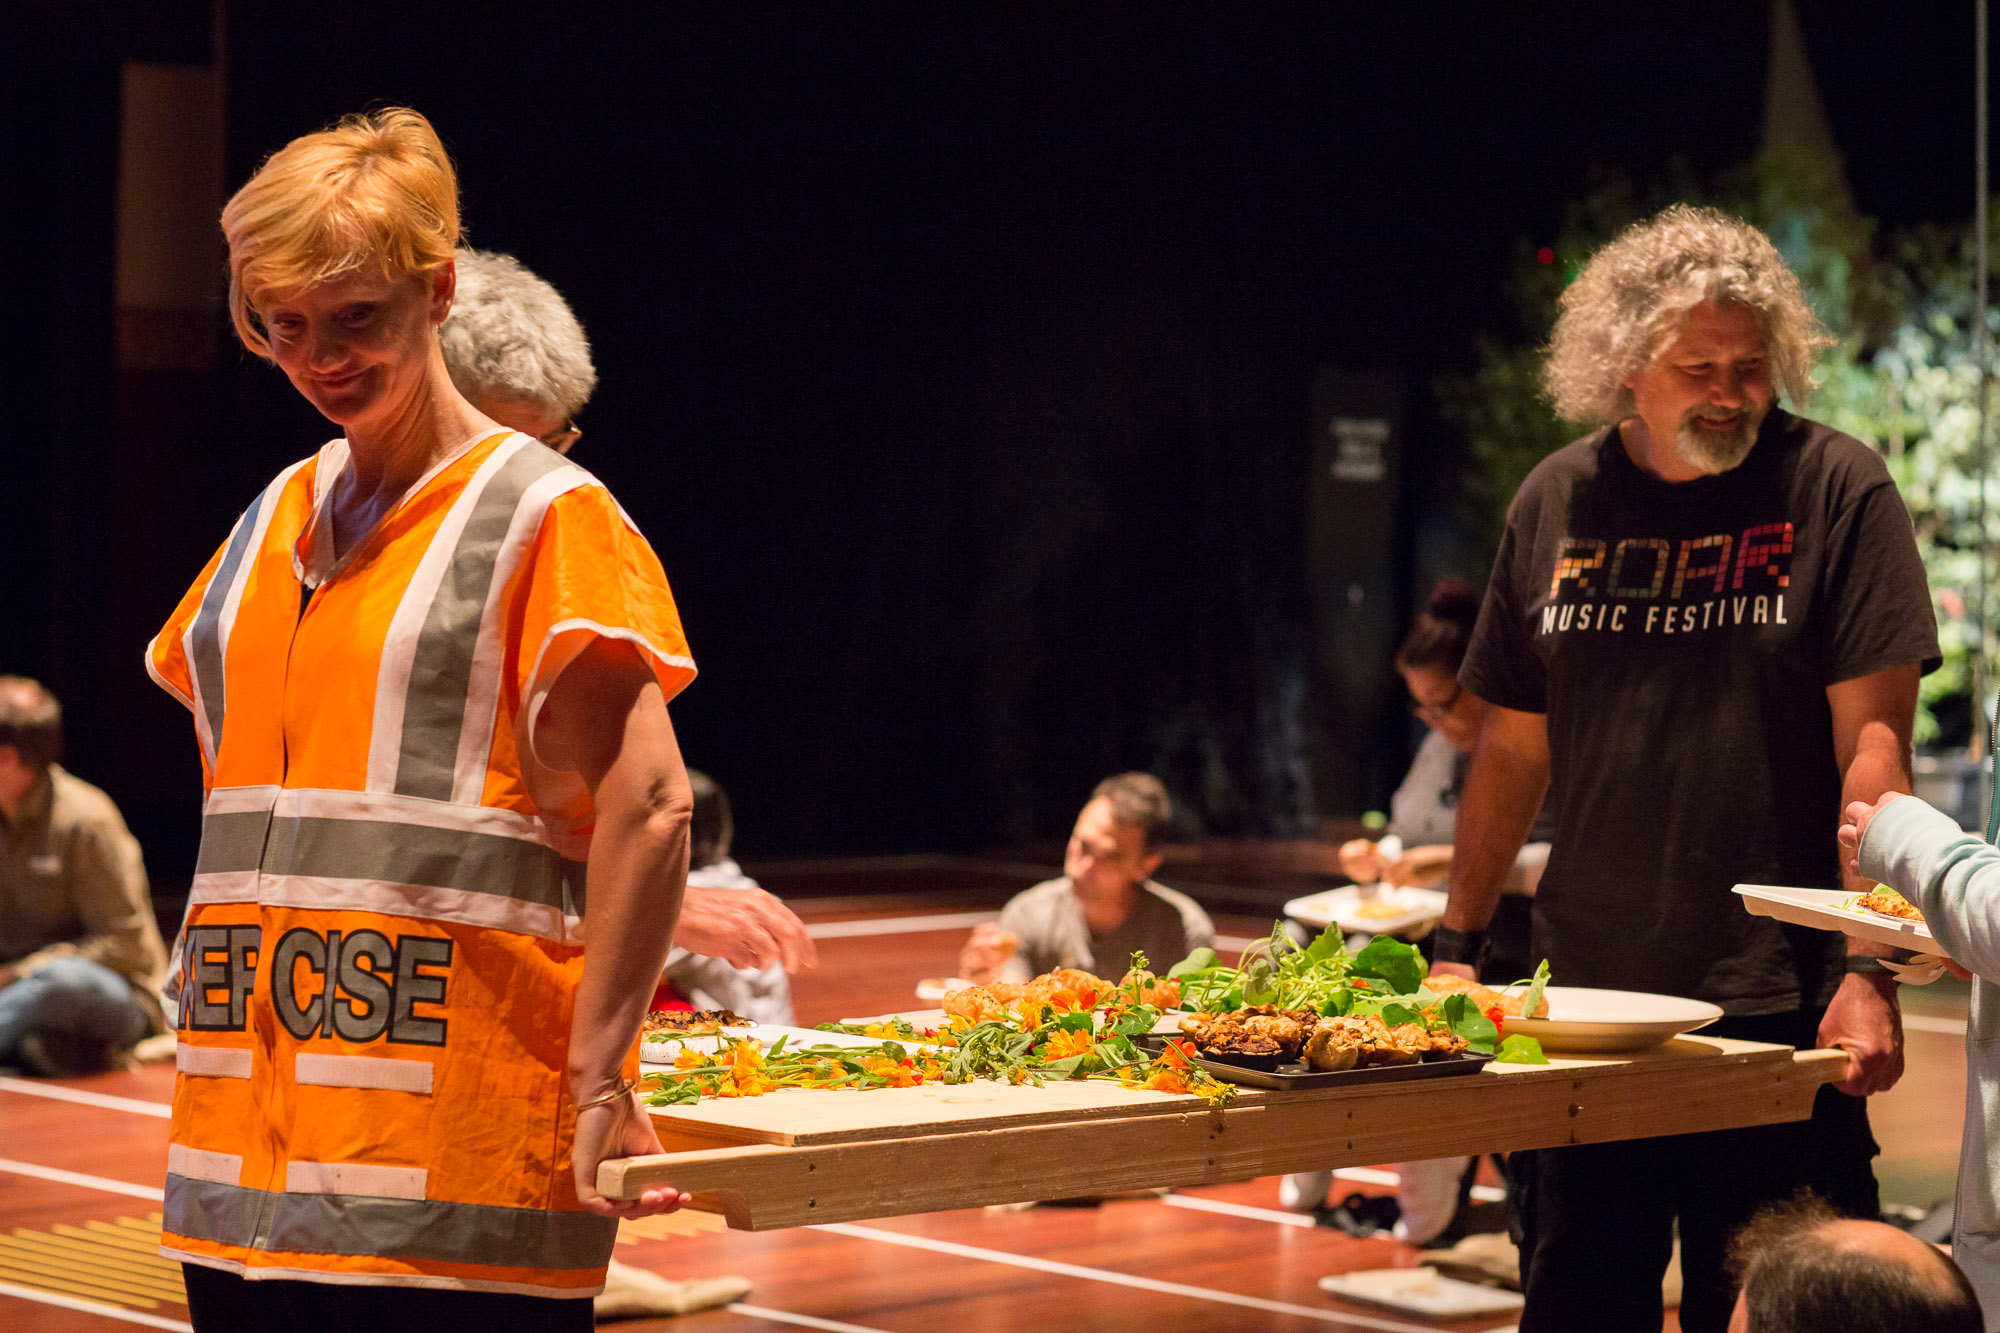 lowres_dinner on stretchers-62.jpg